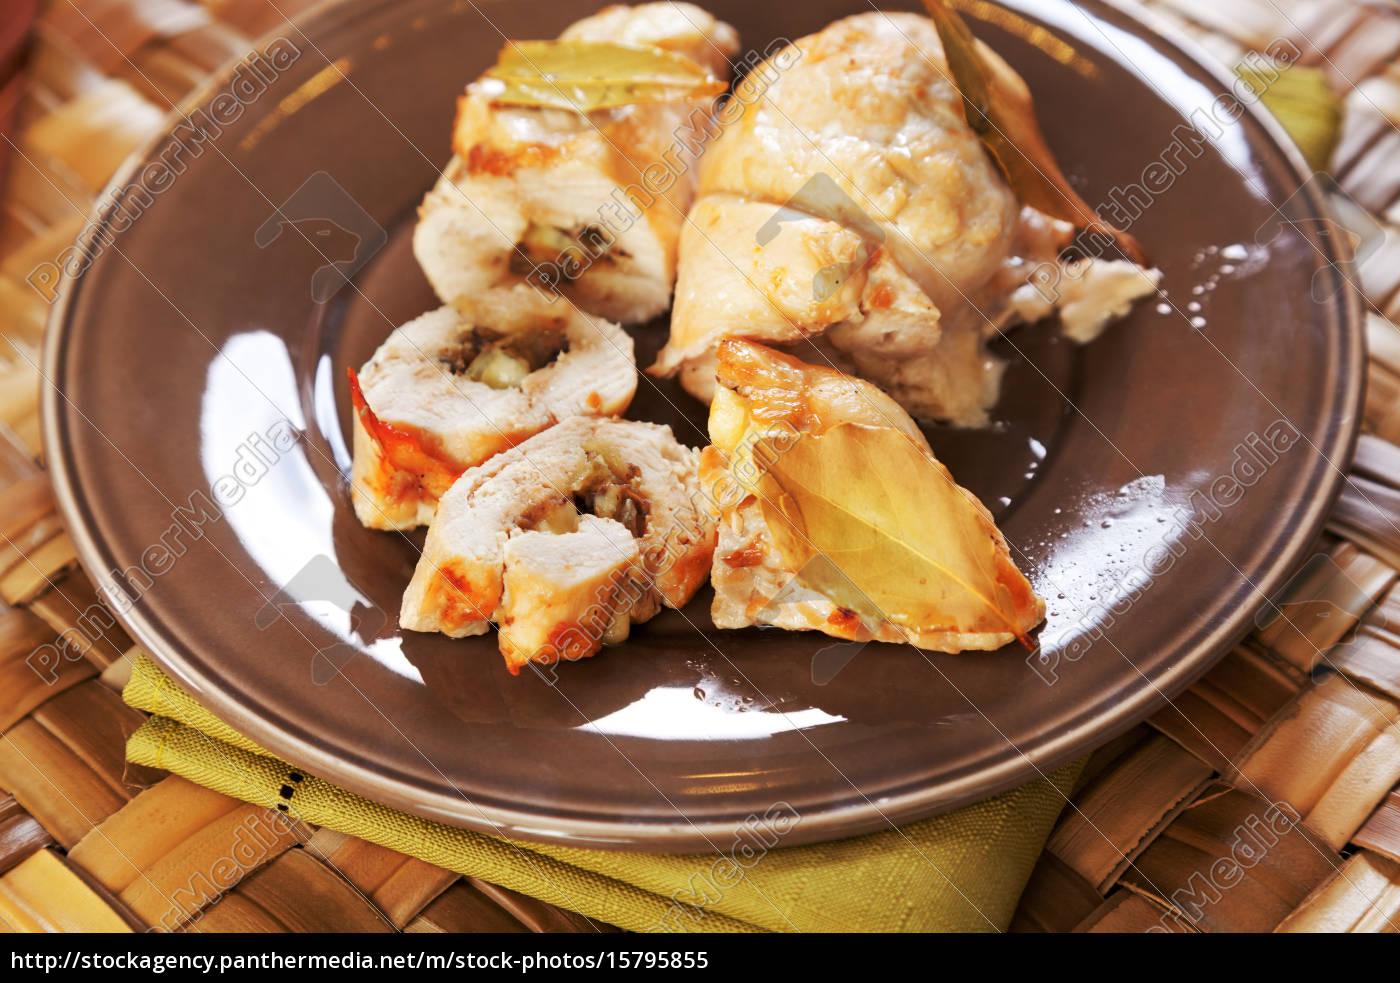 chicken, roulades, chicken, roulades, chicken, roulades, chicken, roulades - 15795855